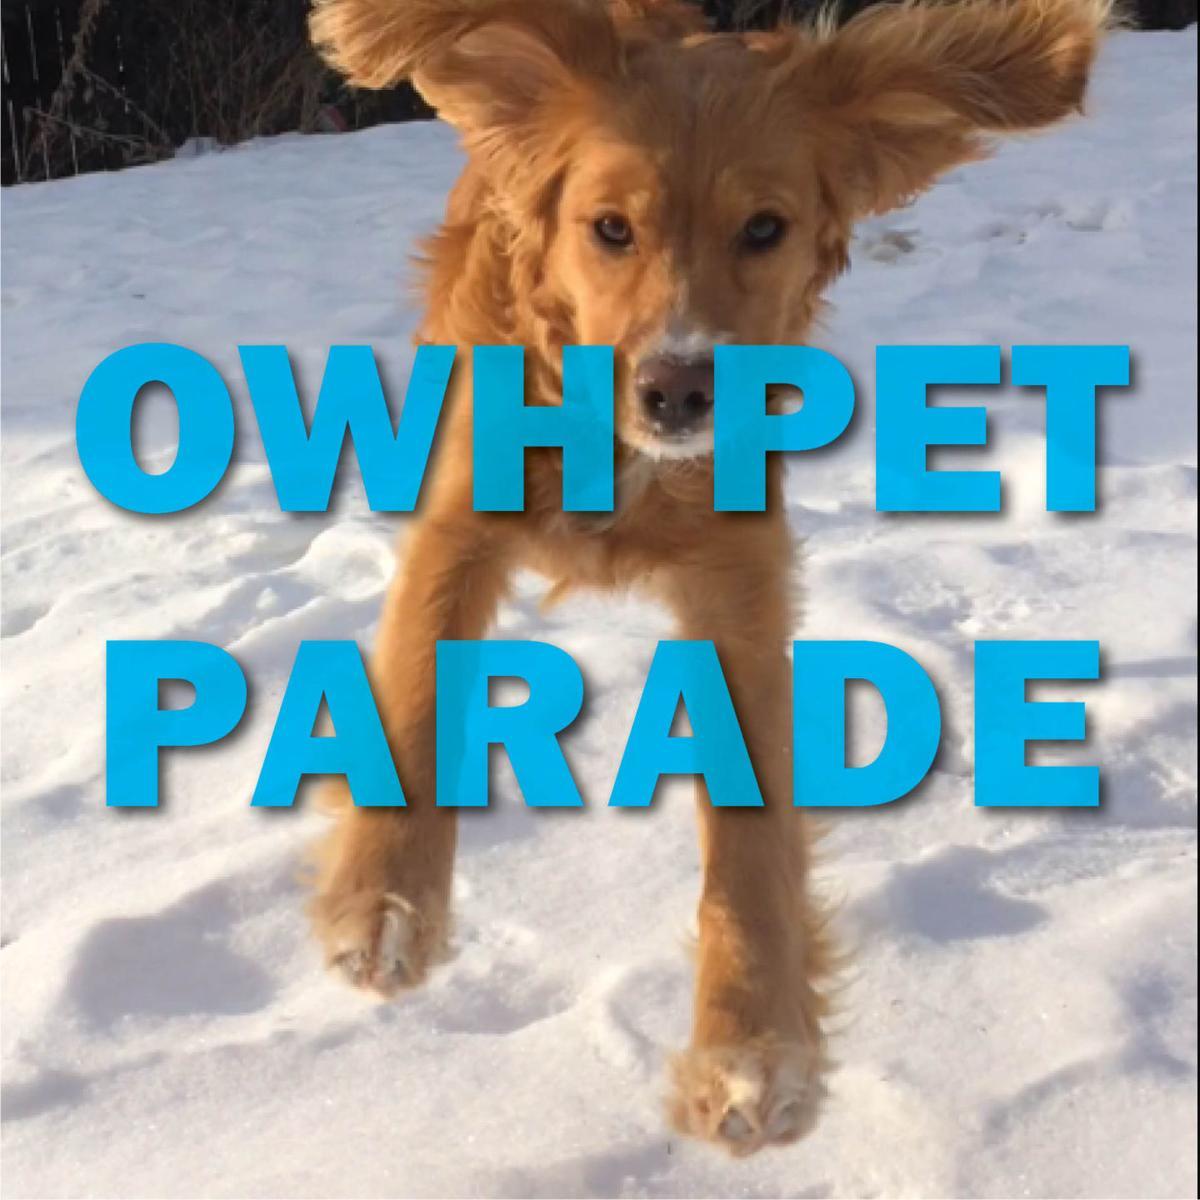 Follow Pet Parade on Twitter